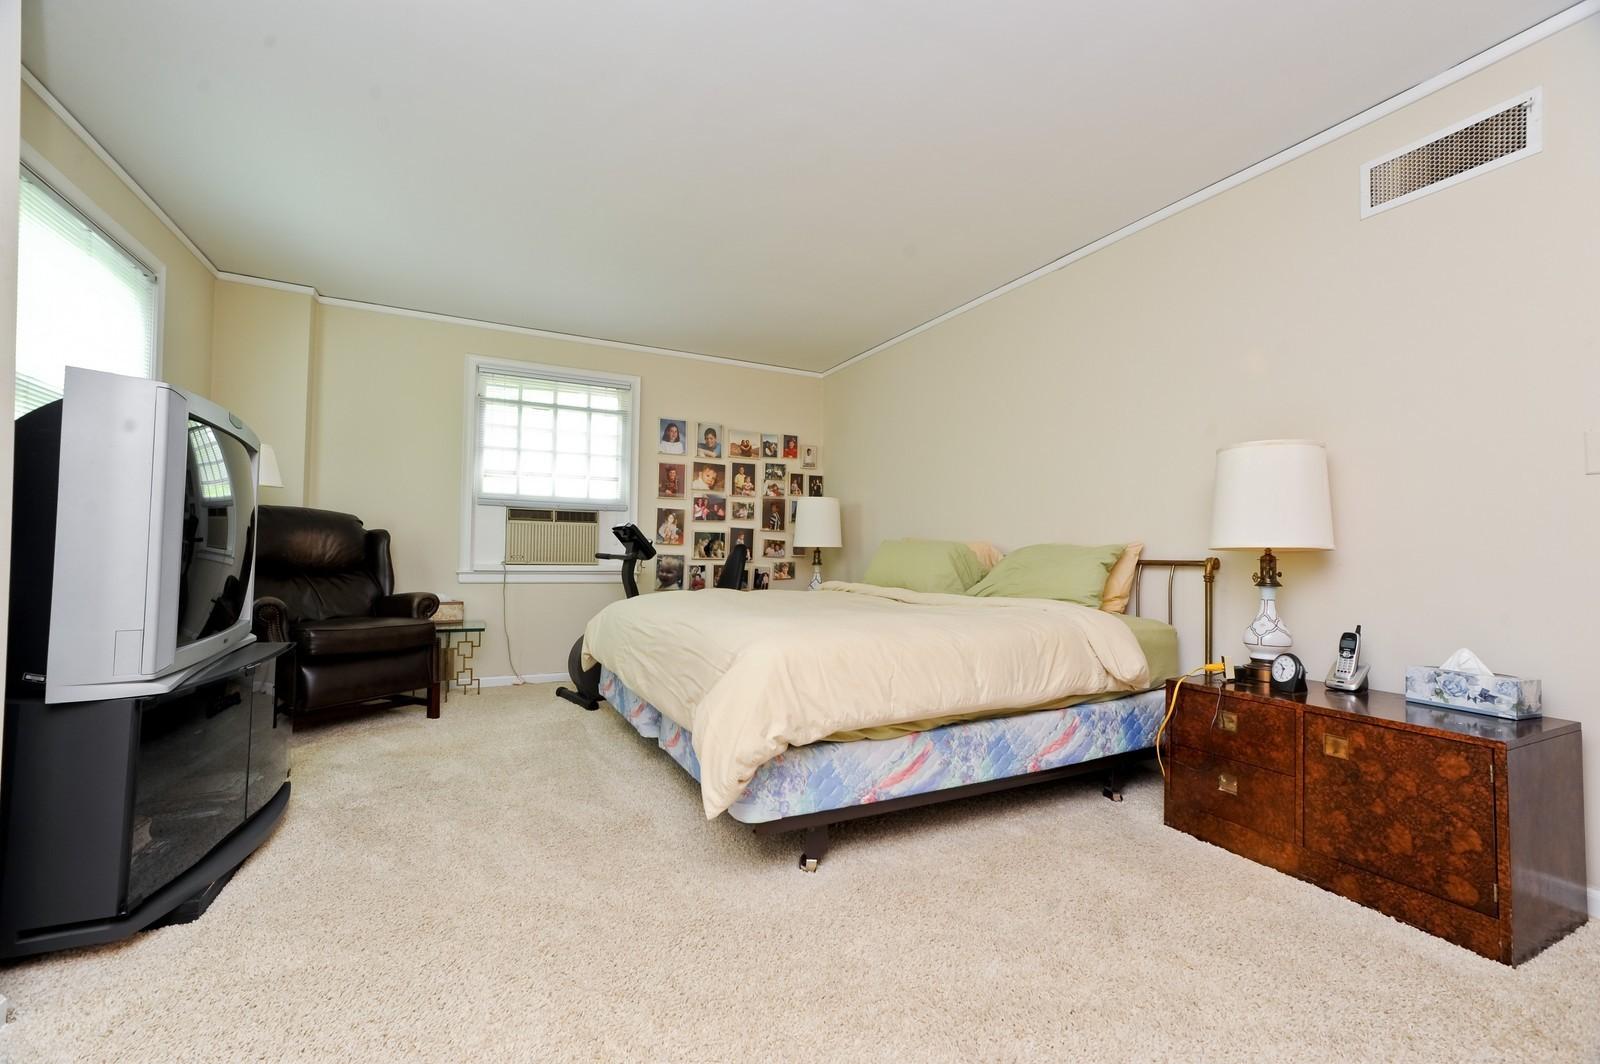 Real Estate Photography - 220 Braeburn Ave, Highland Park, IL, 60035 - Master Bedroom